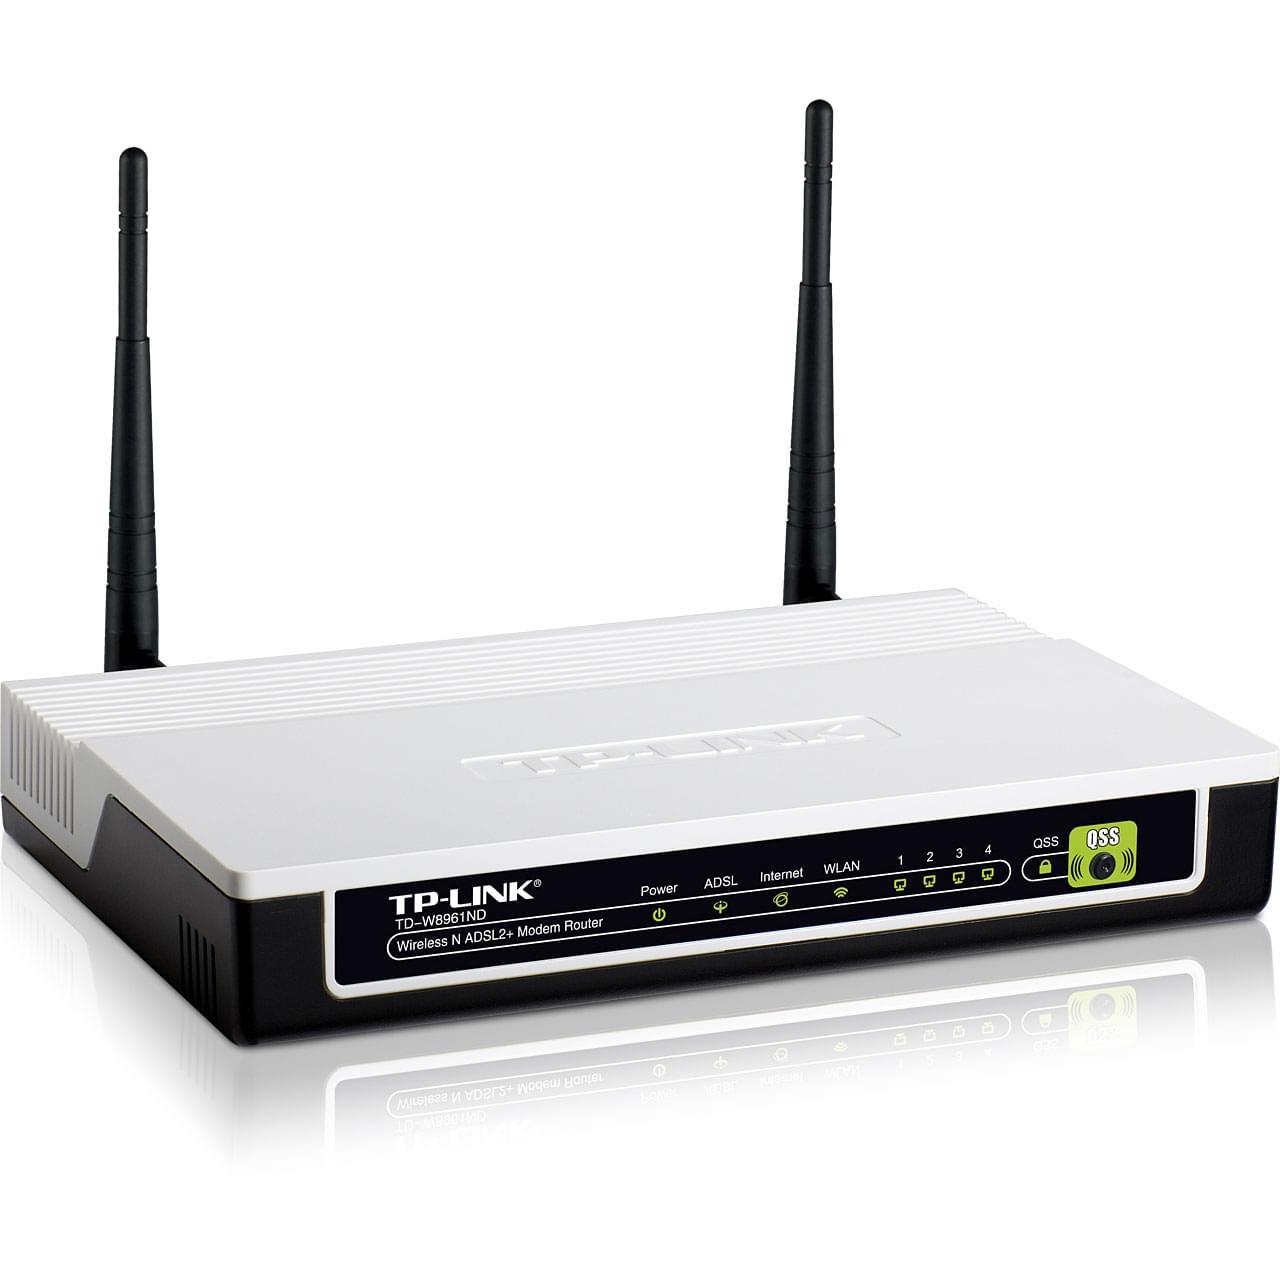 TP-Link TD-W8961ND (TD-W8961ND  /  318961) - Achat / Vente Routeur sur Cybertek.fr - 0